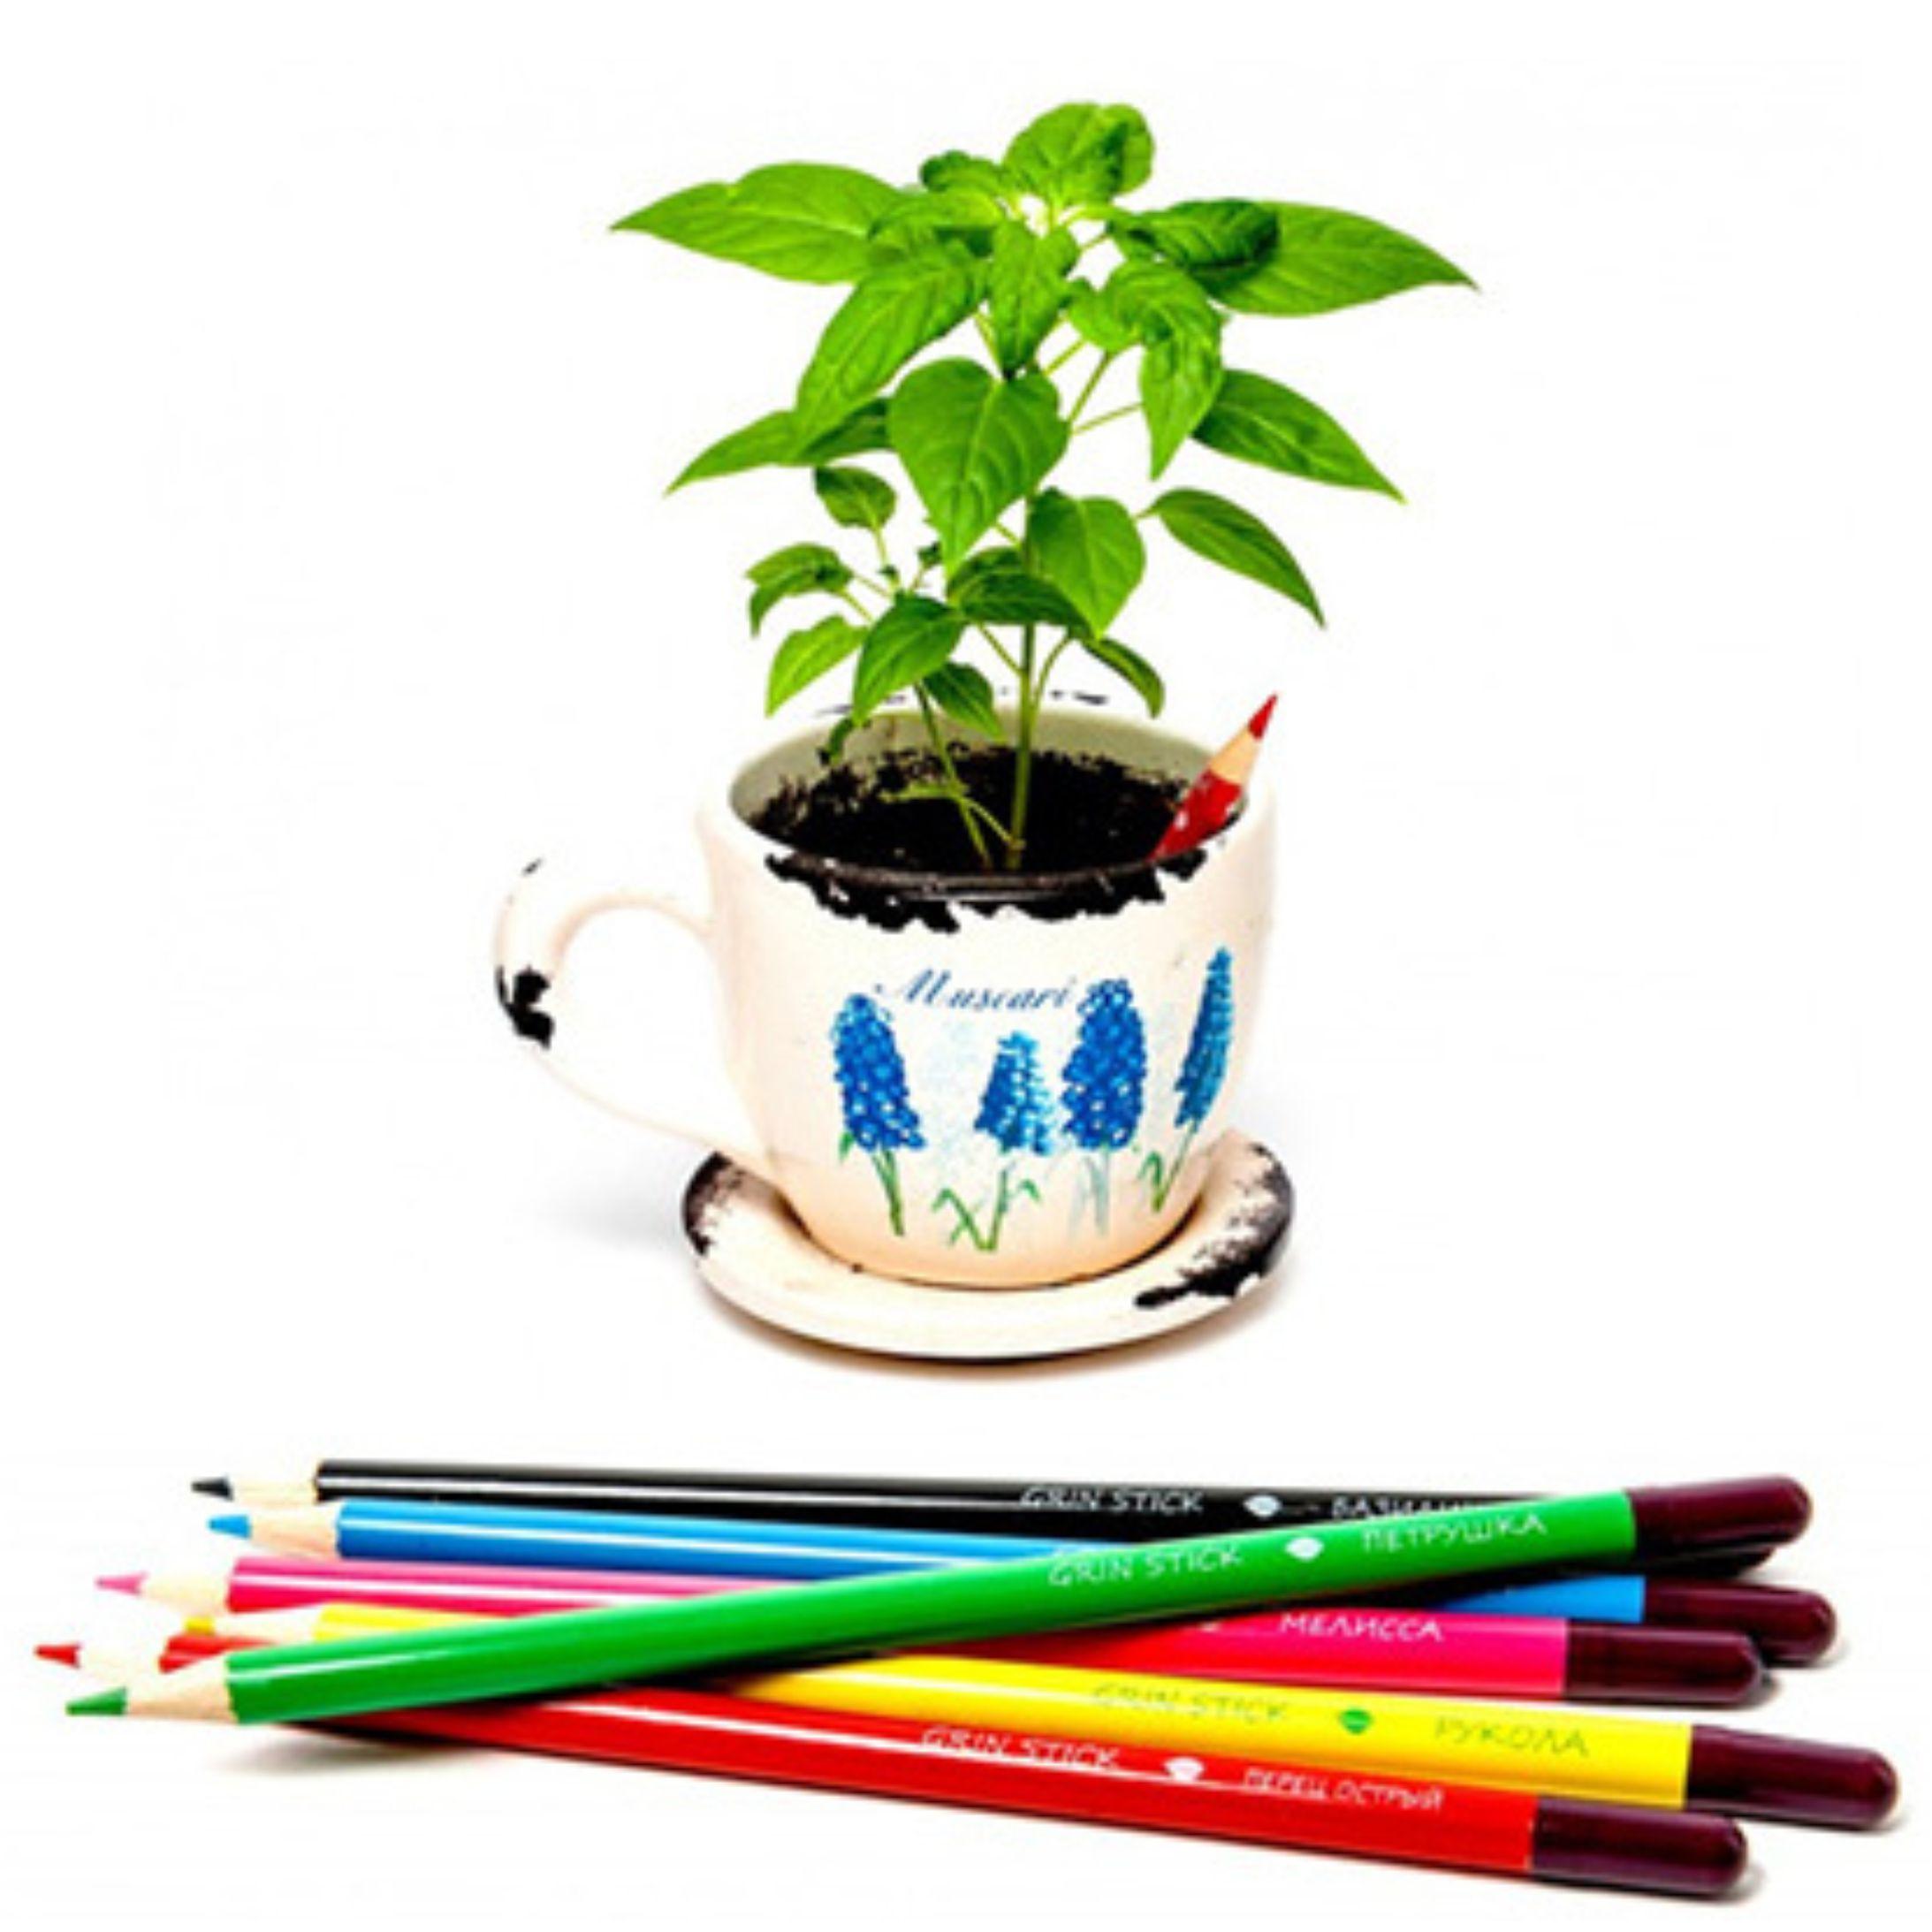 растущие карандаши с логотипом